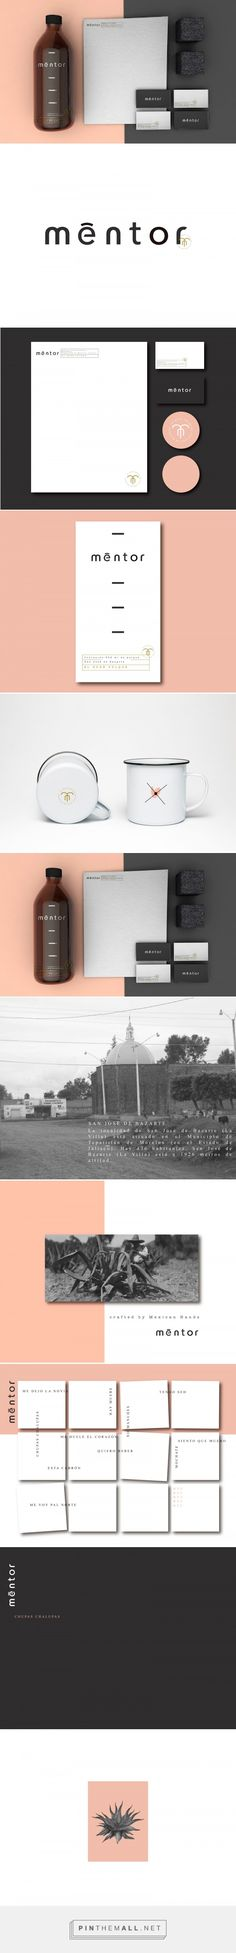 Mentor Branding by Hi Estudio   Fivestar Branding Agency – Design and Branding Agency & Curated Inspiration Gallery